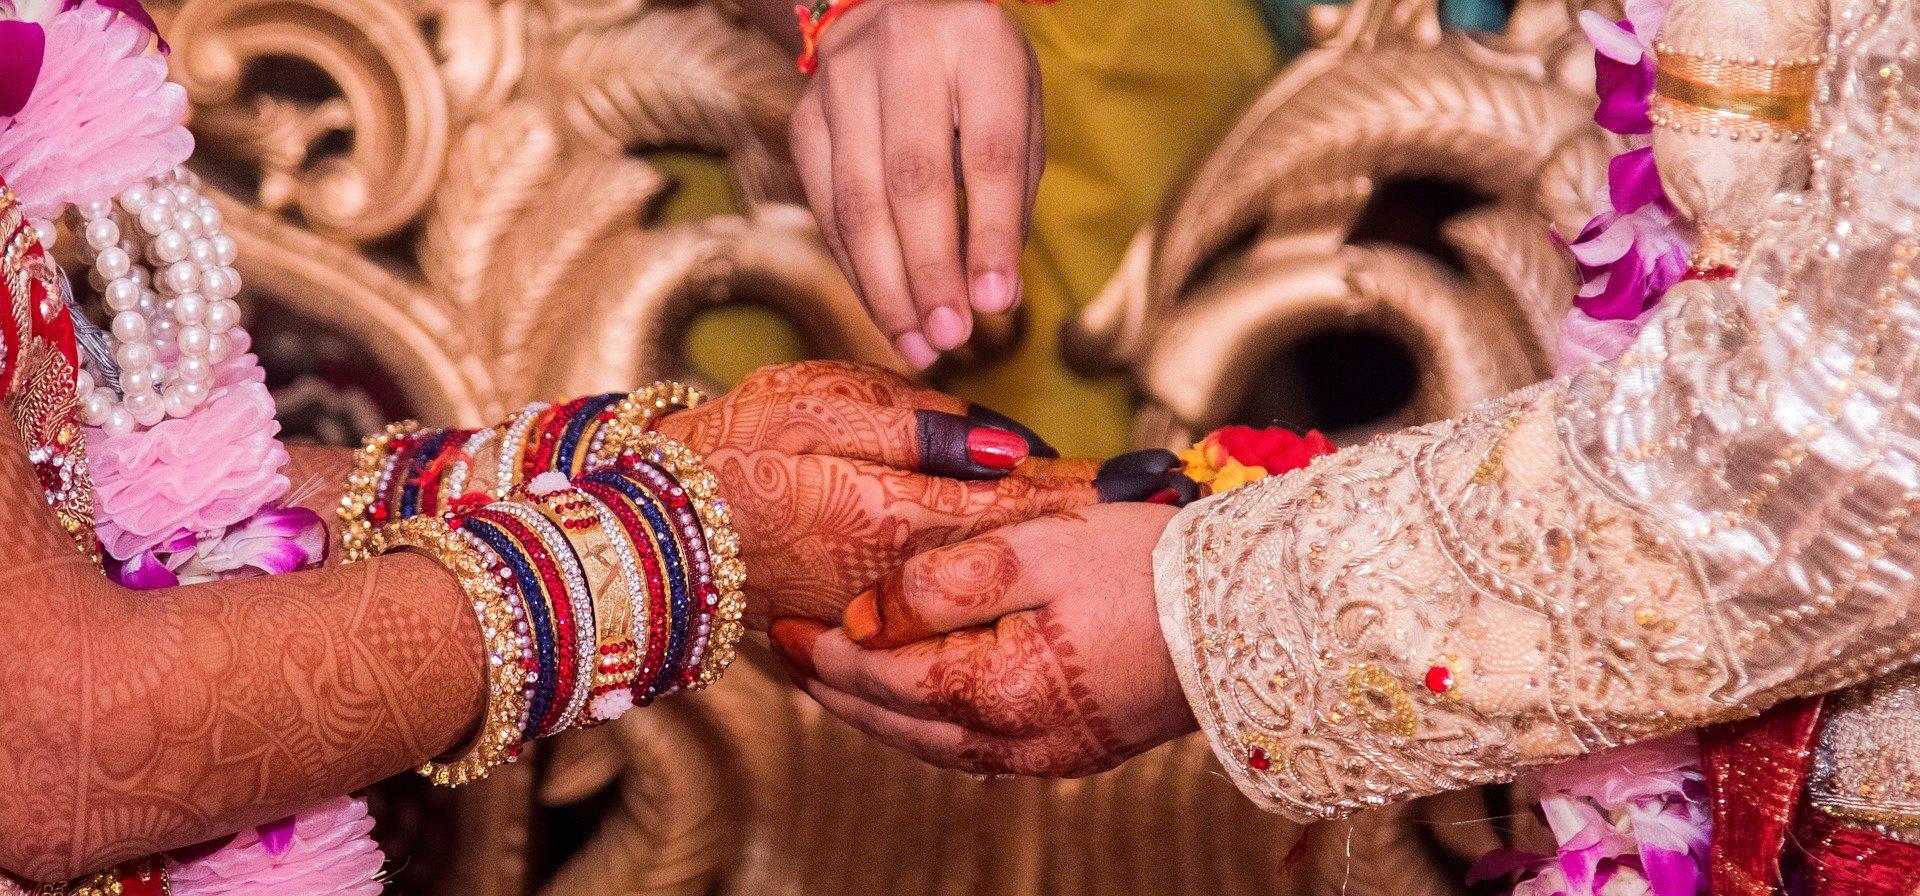 indiano dating siti matrimoniali